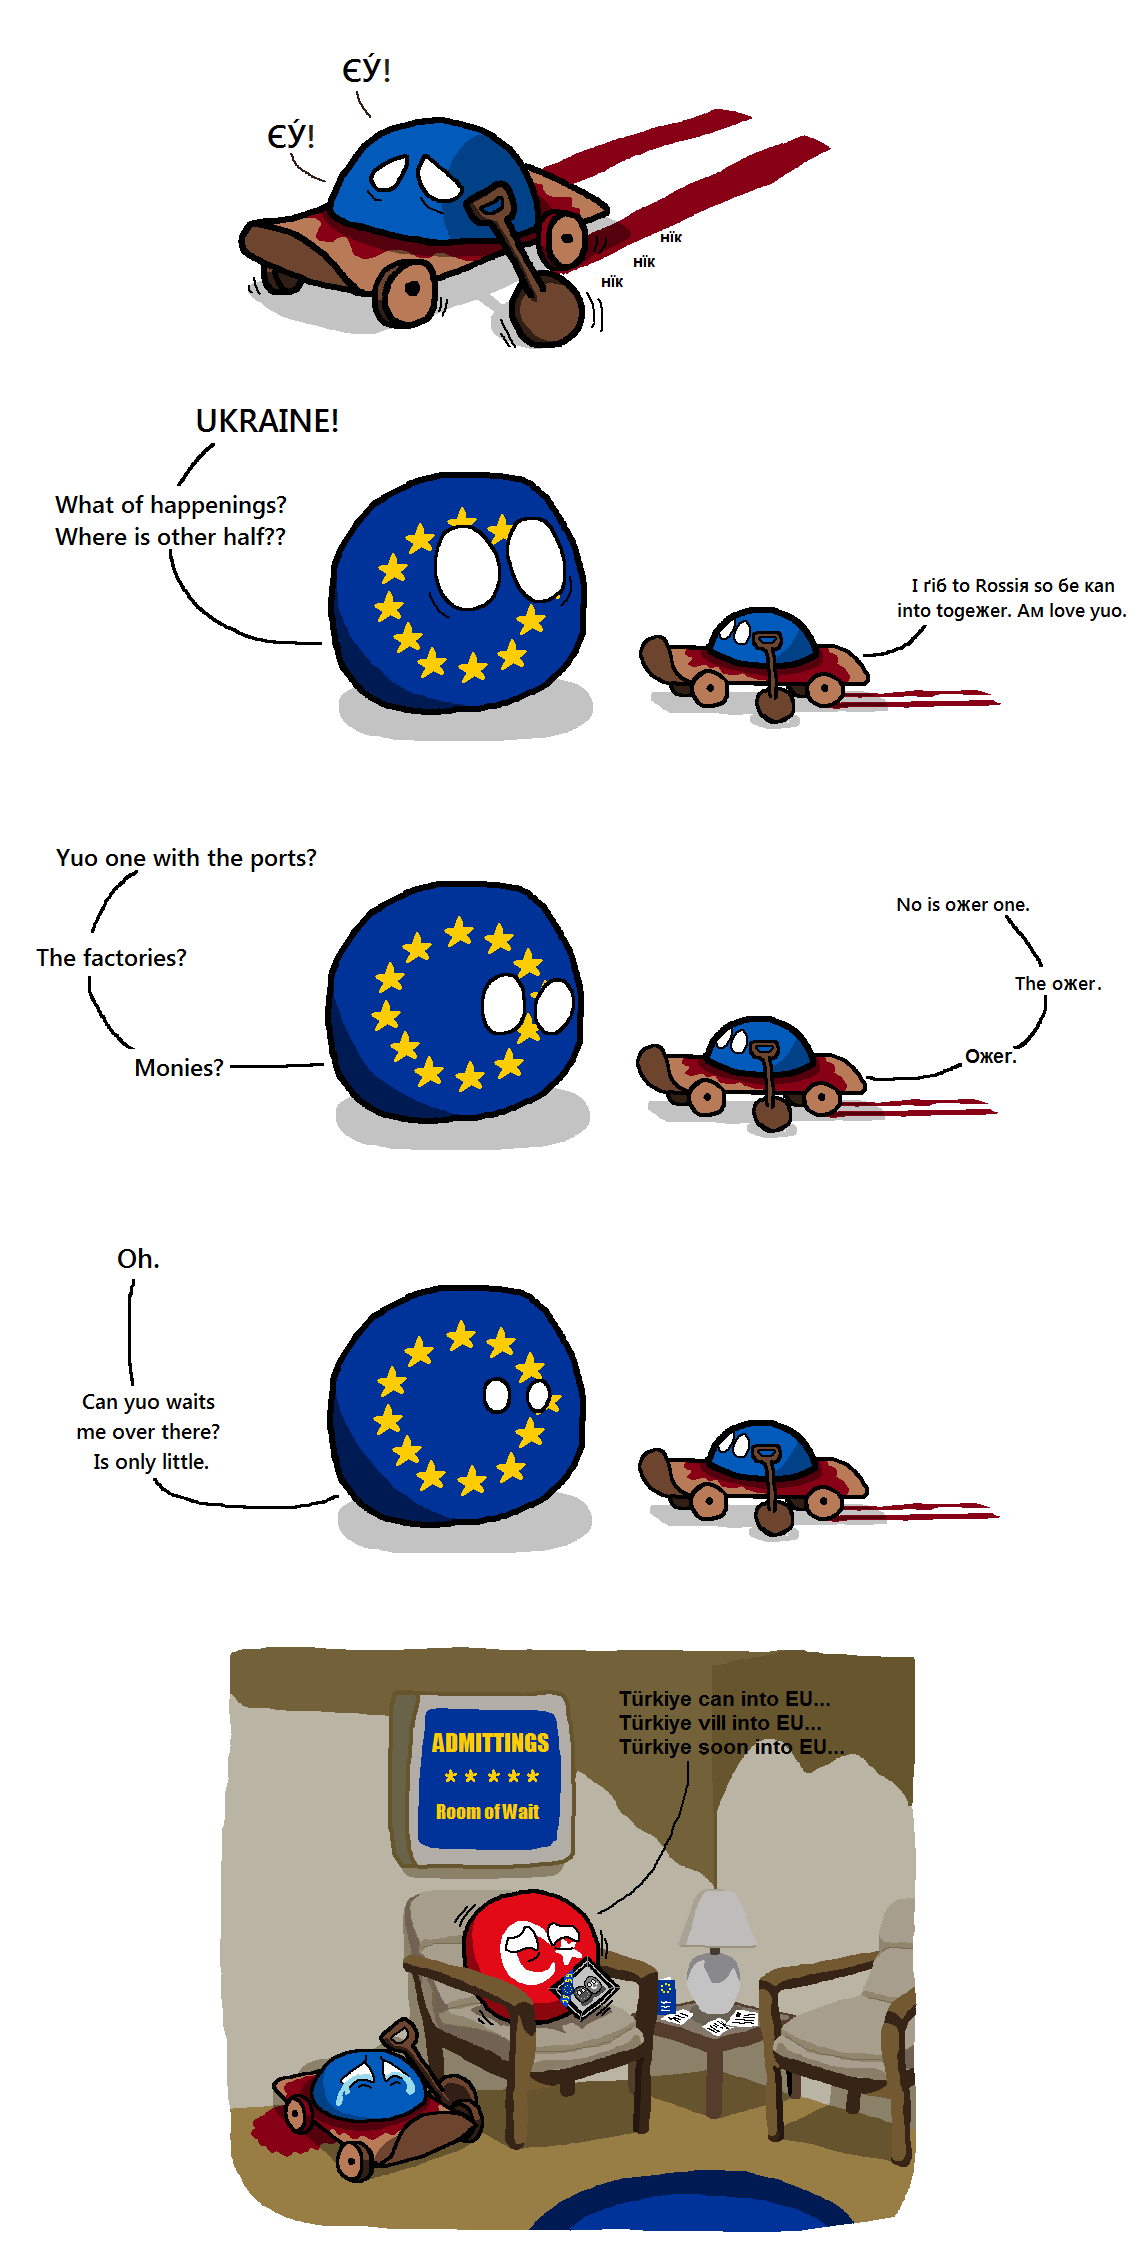 country-balls-ukraine-s-great-sacrifice.